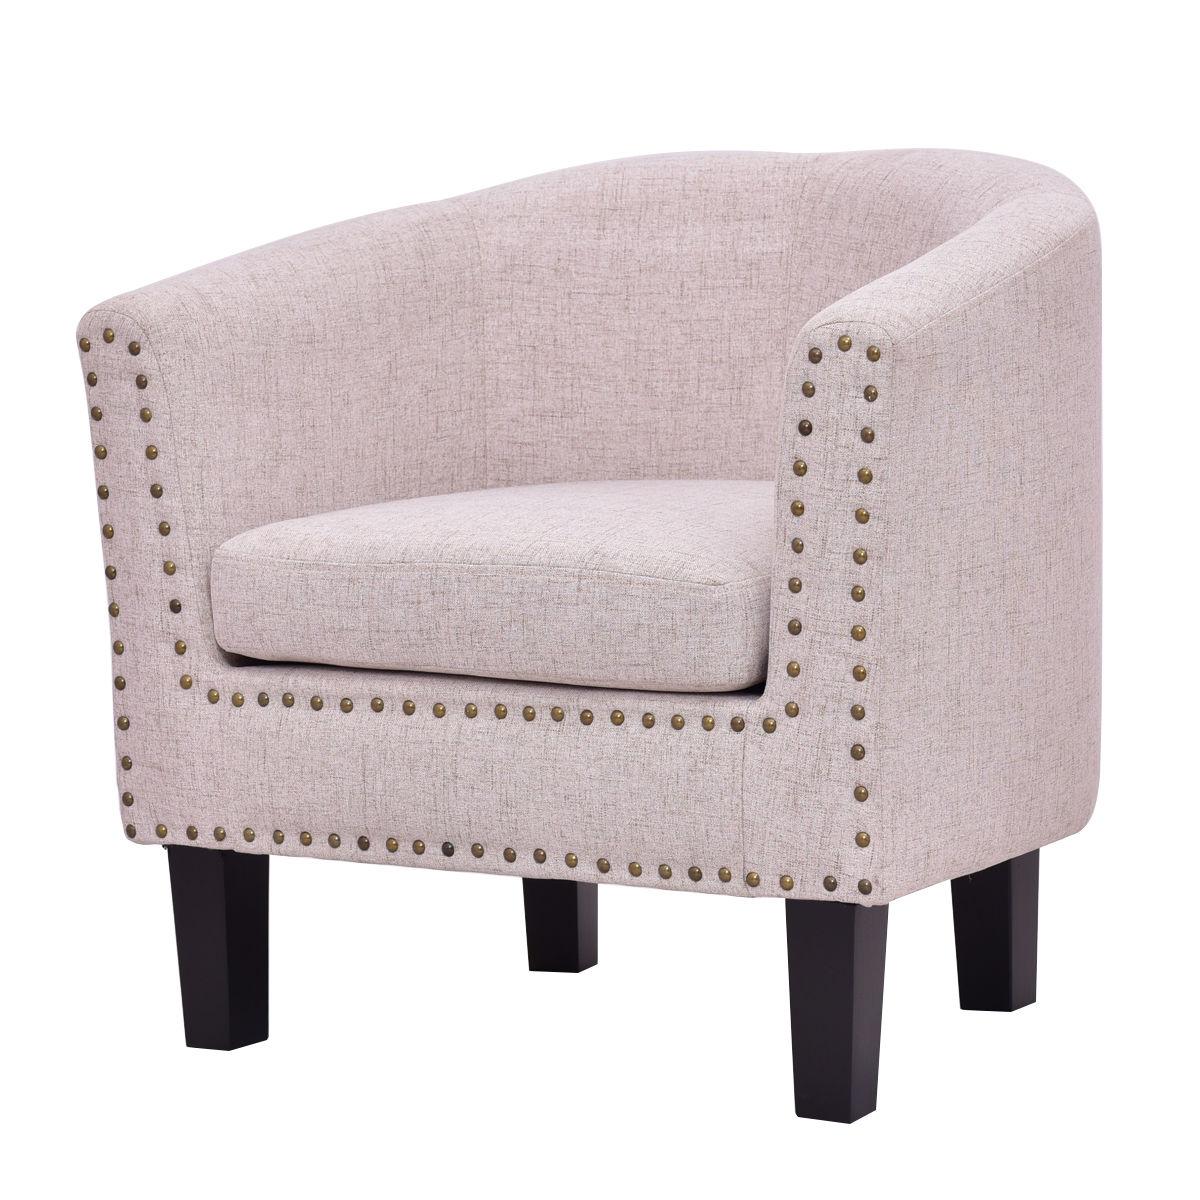 Giantex Modern Living Room Armchair Accent Fabric Rivets ...